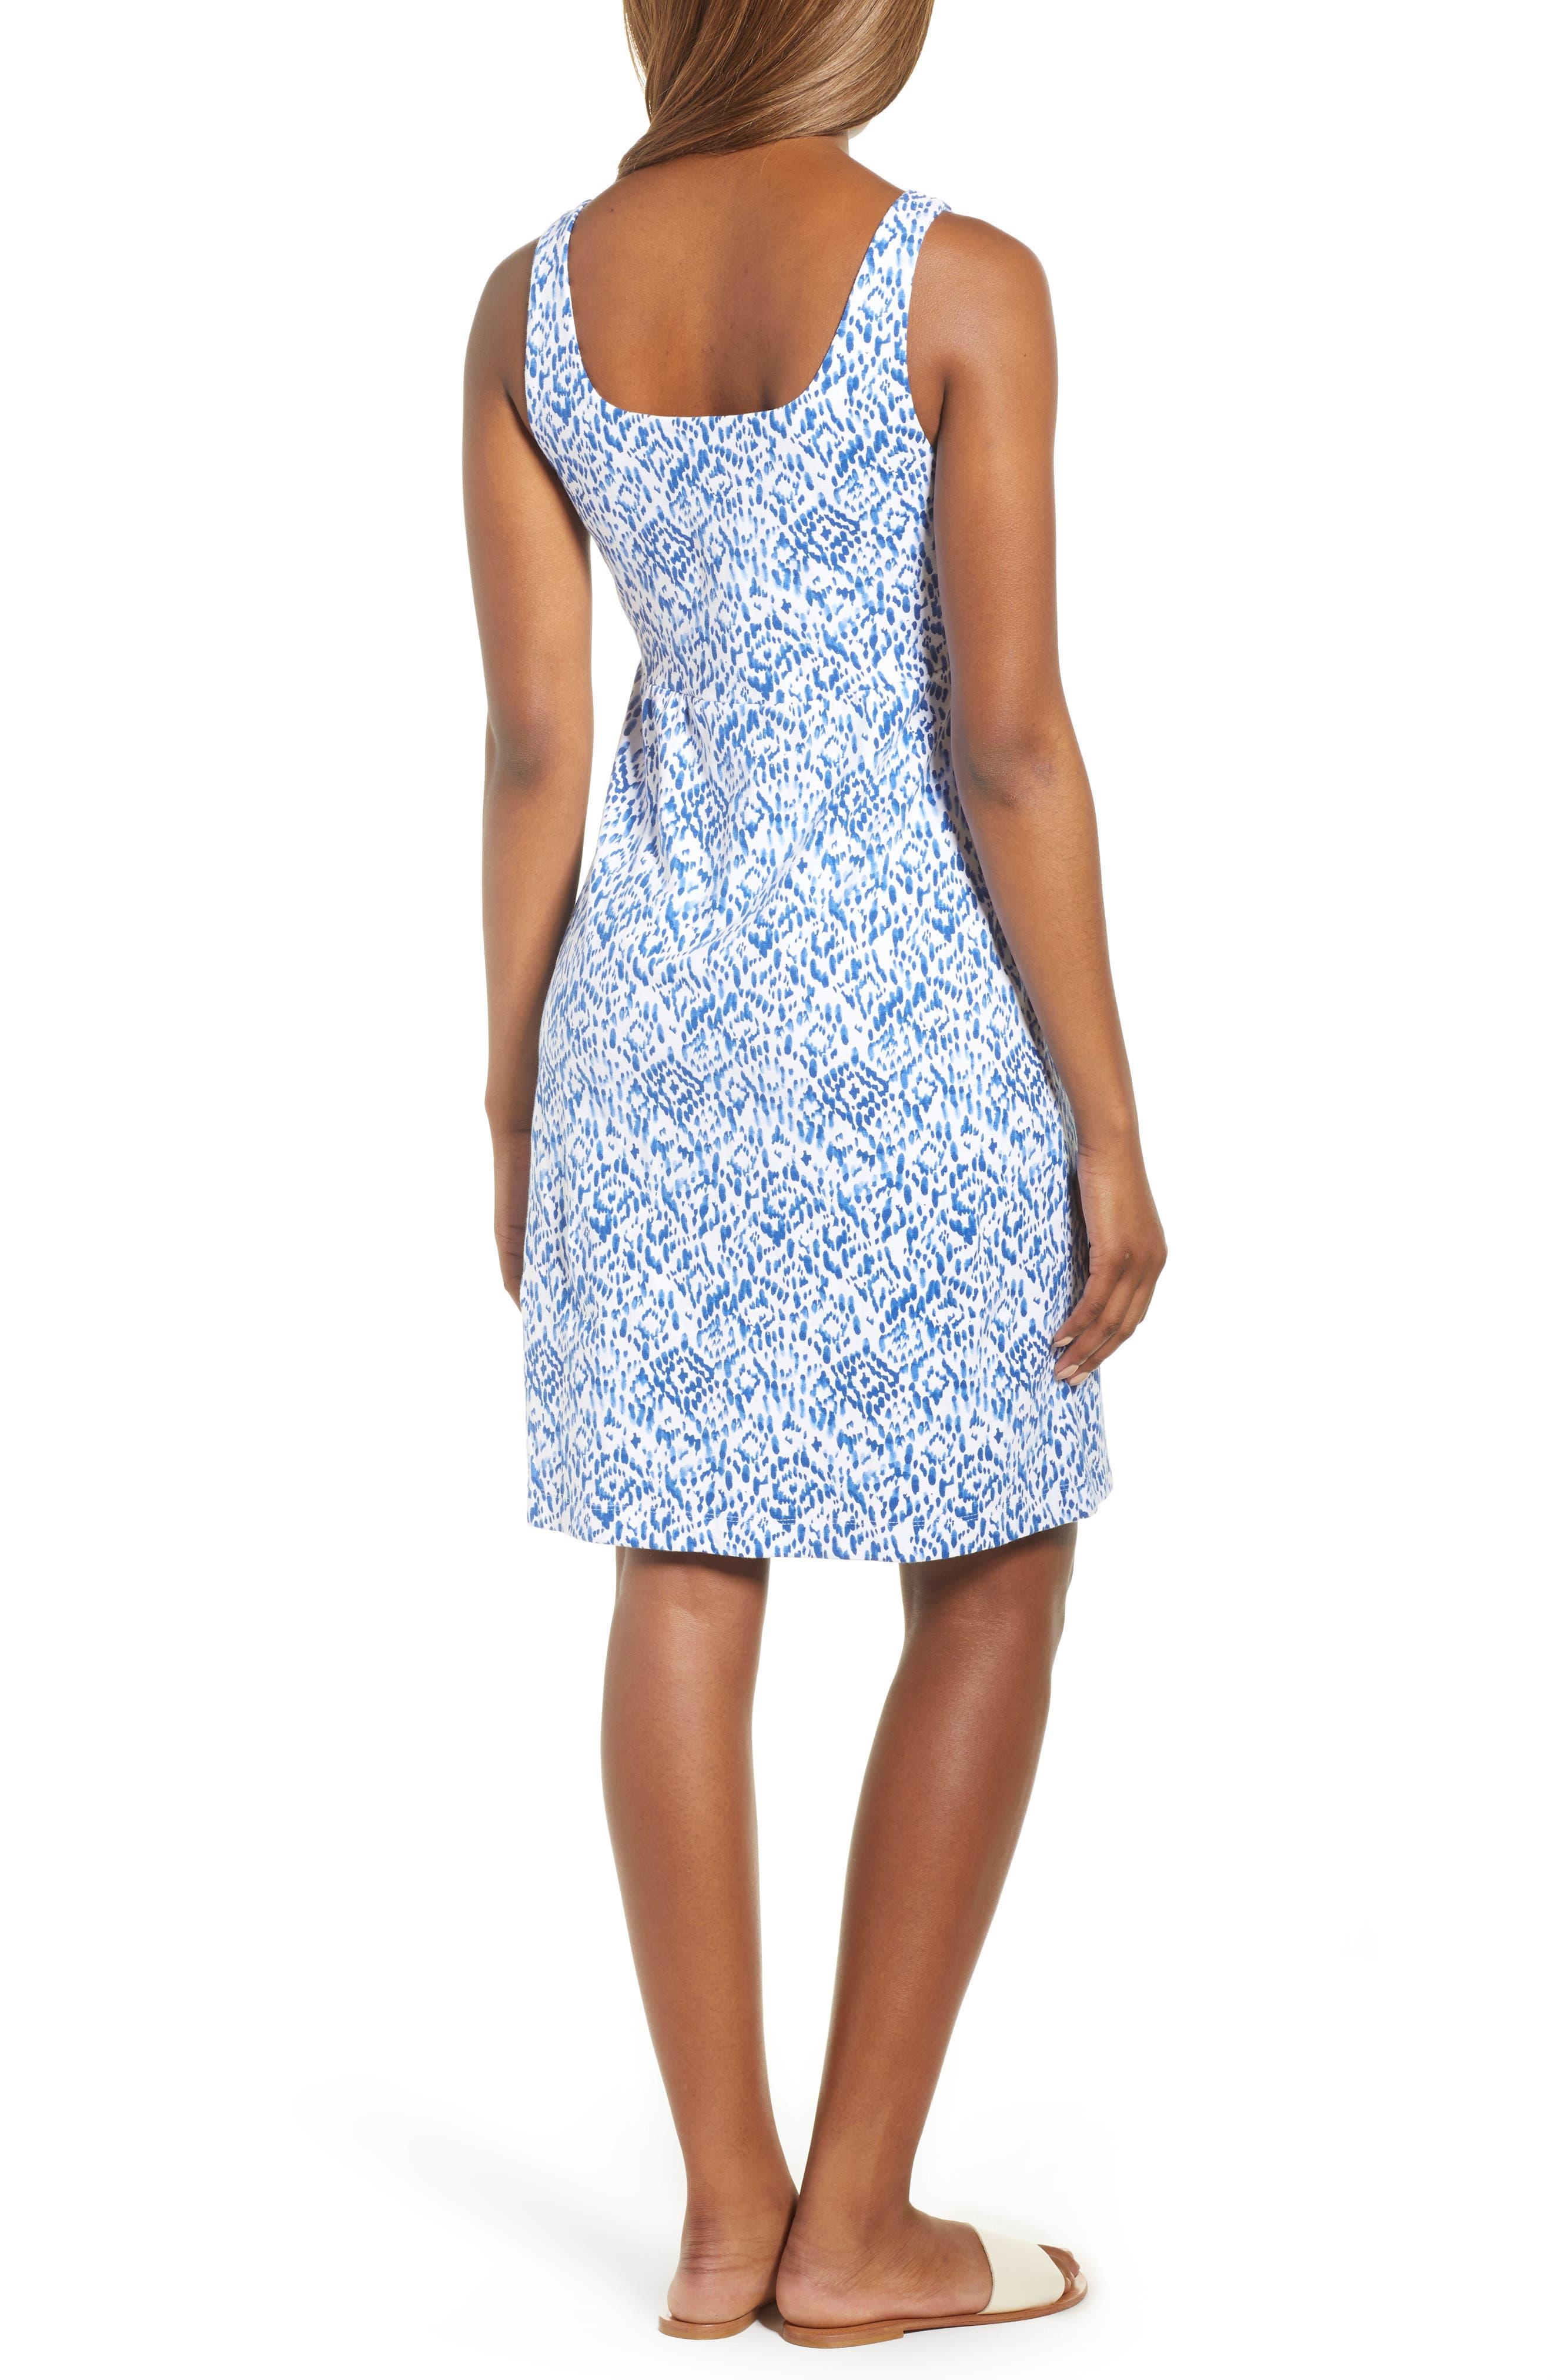 La Liorena Sleeveless Stretch Cotton Tank Dress,                             Alternate thumbnail 2, color,                             Palace Blue